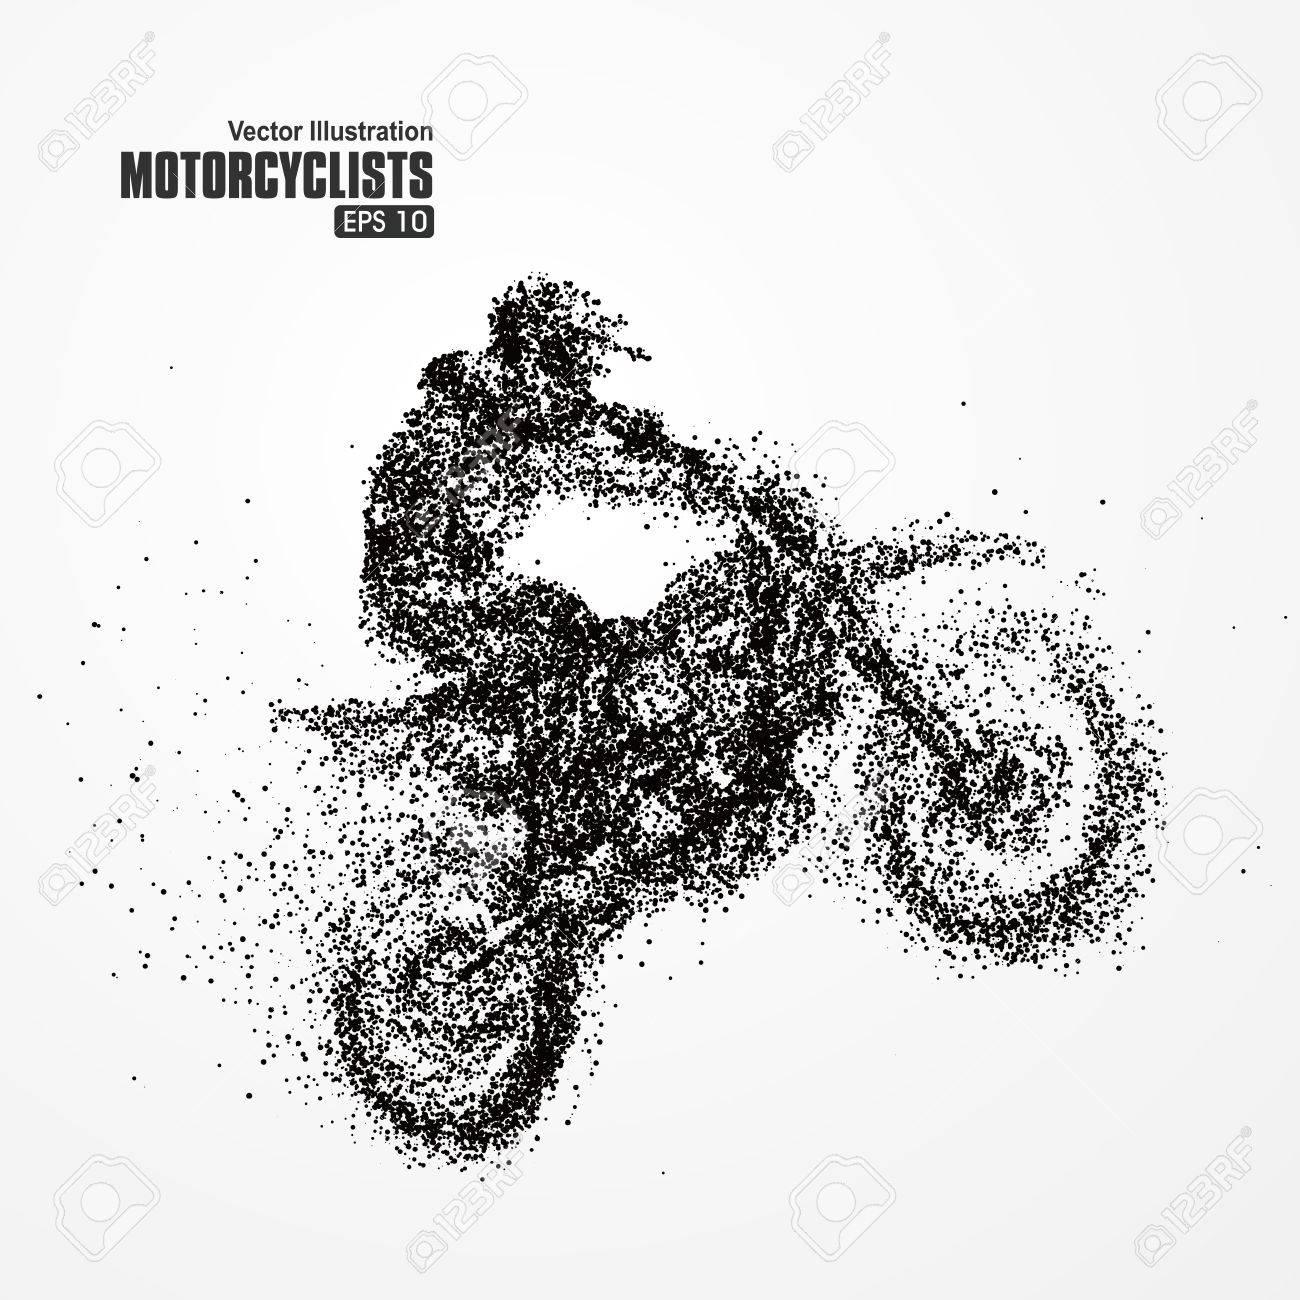 Particles biker, full of enterprising across significance vector illustration. - 52738011